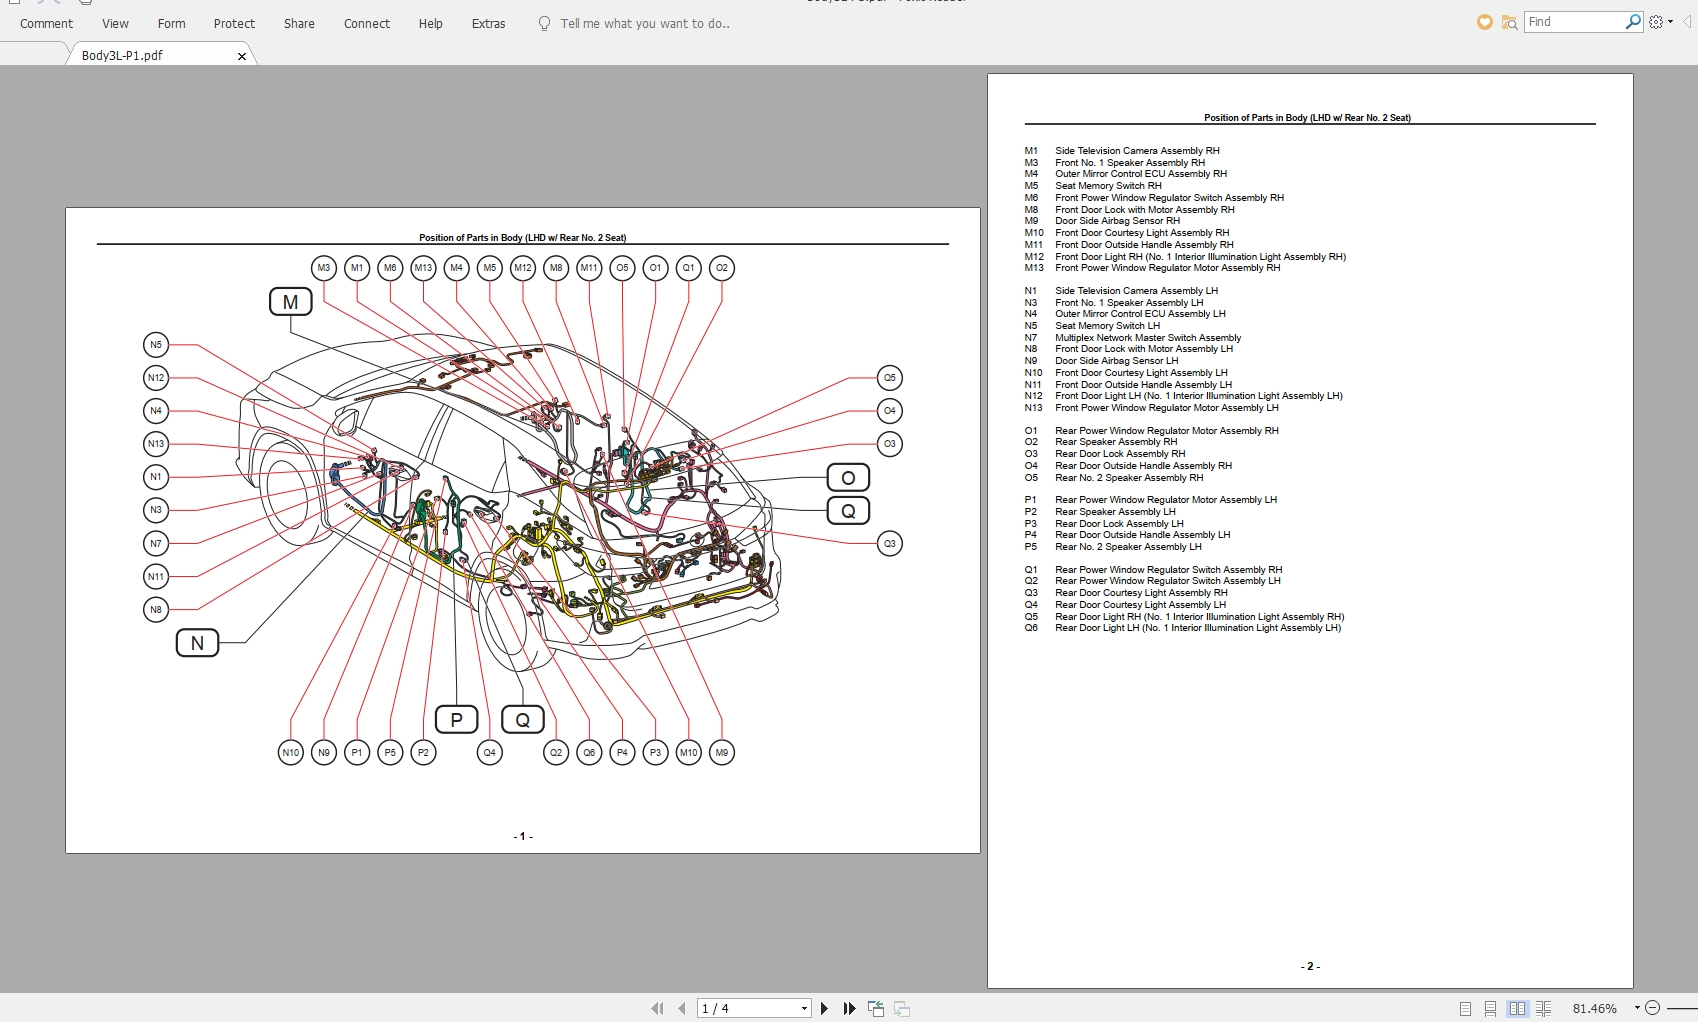 Lexus Rx200t  Rx300  Rx350  Rx350l  2017 12  Electrical Wiring Diagram - Homepage